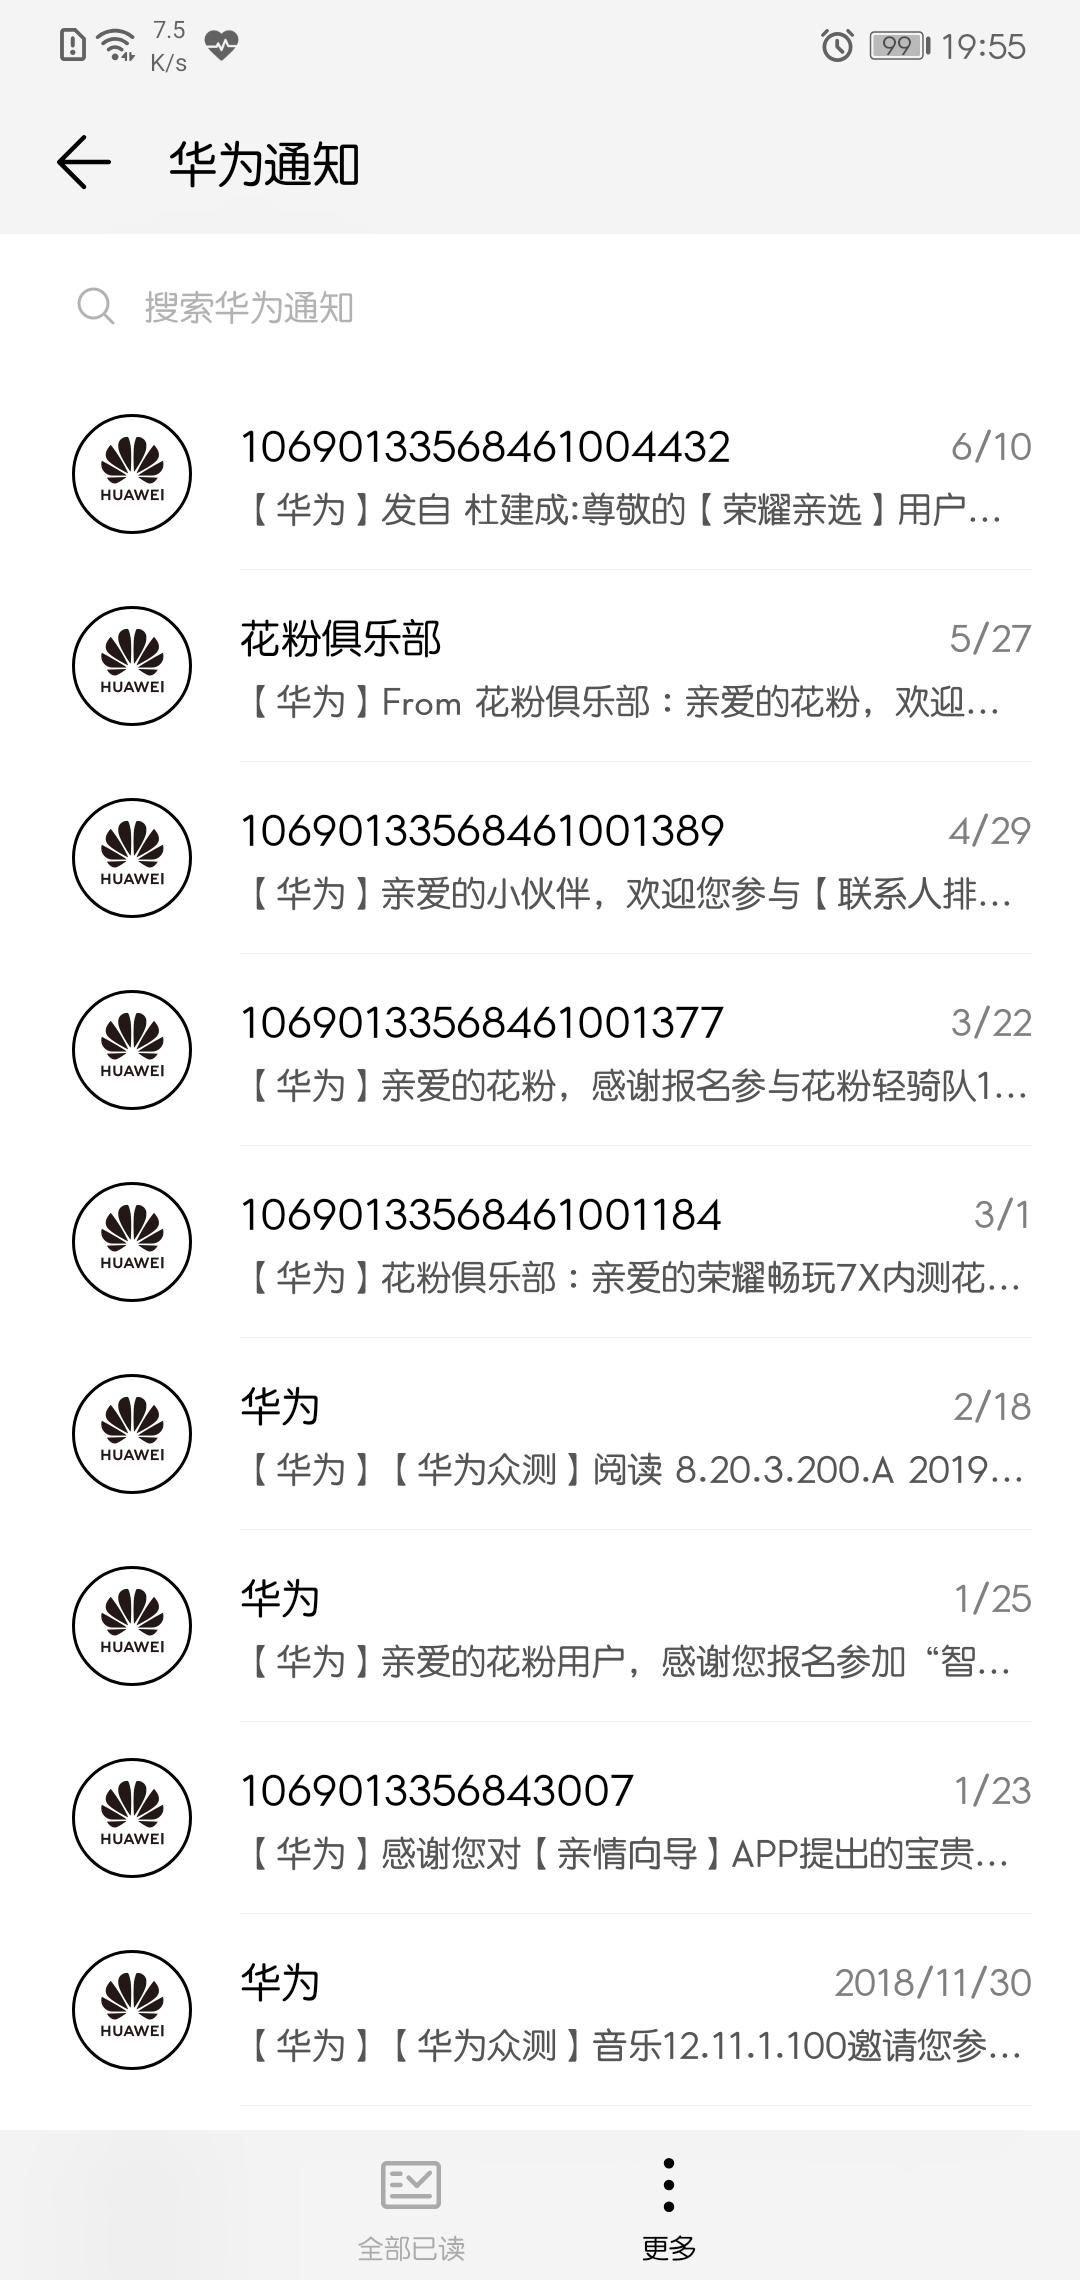 Screenshot_20190618_195503_com.android.mms.jpg